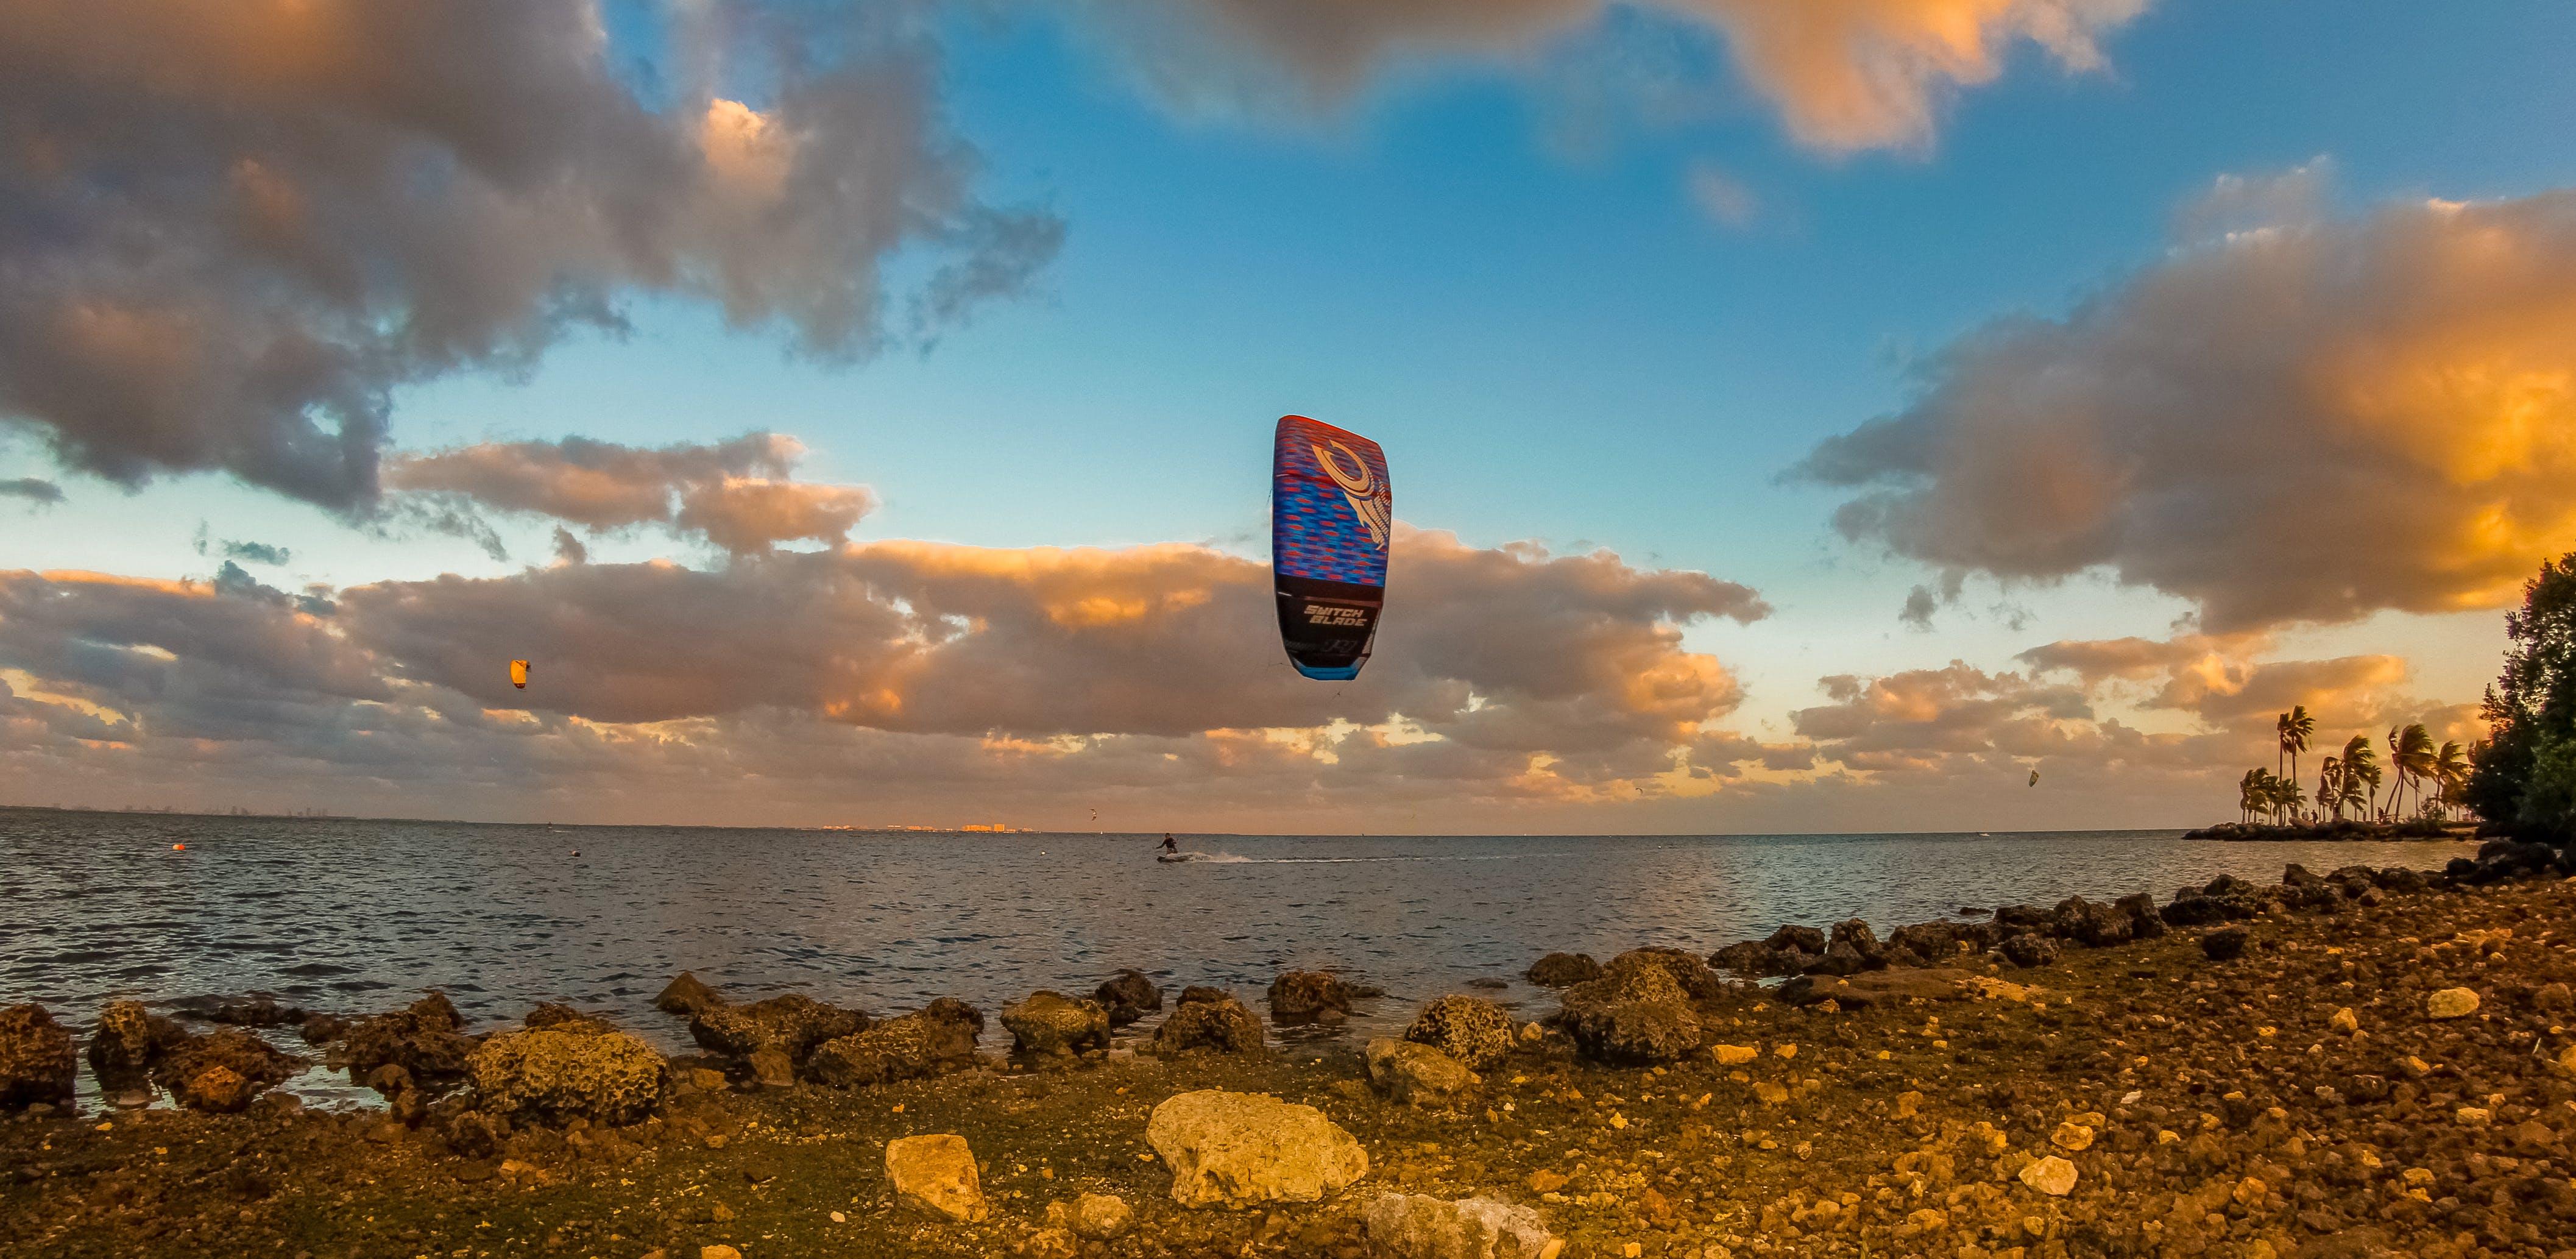 Free stock photo of beach, beachlife, kite, kiteboarding